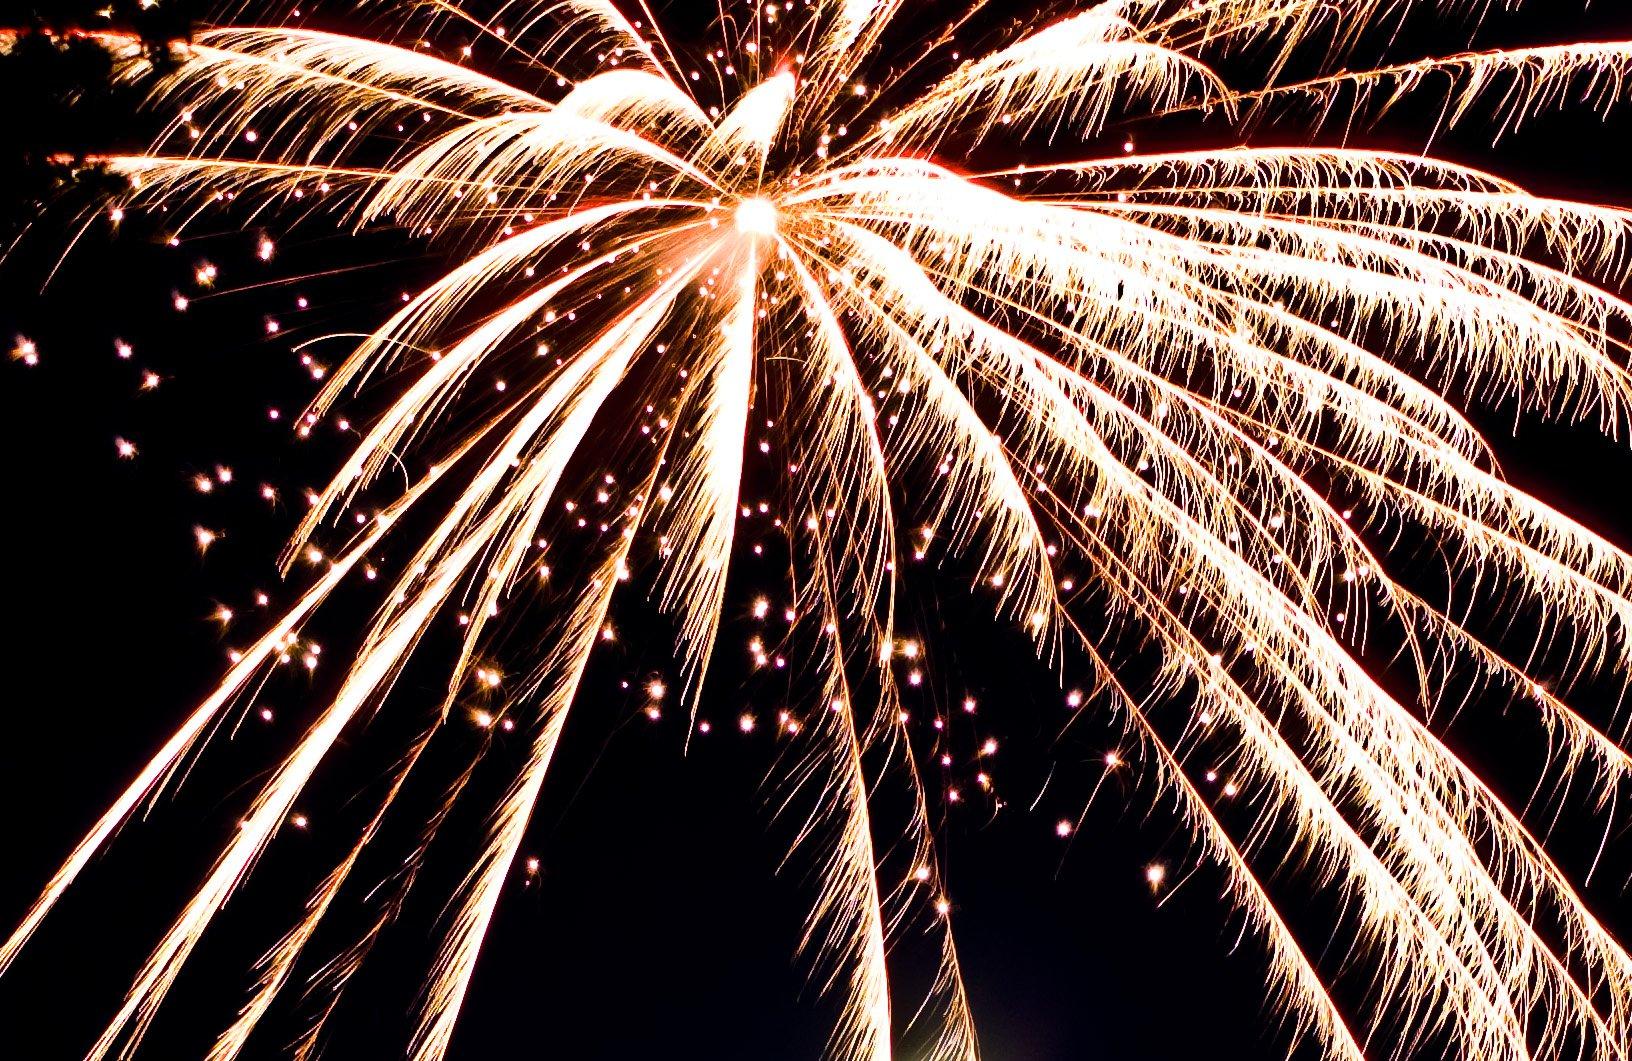 Fireworks - 1 of 2